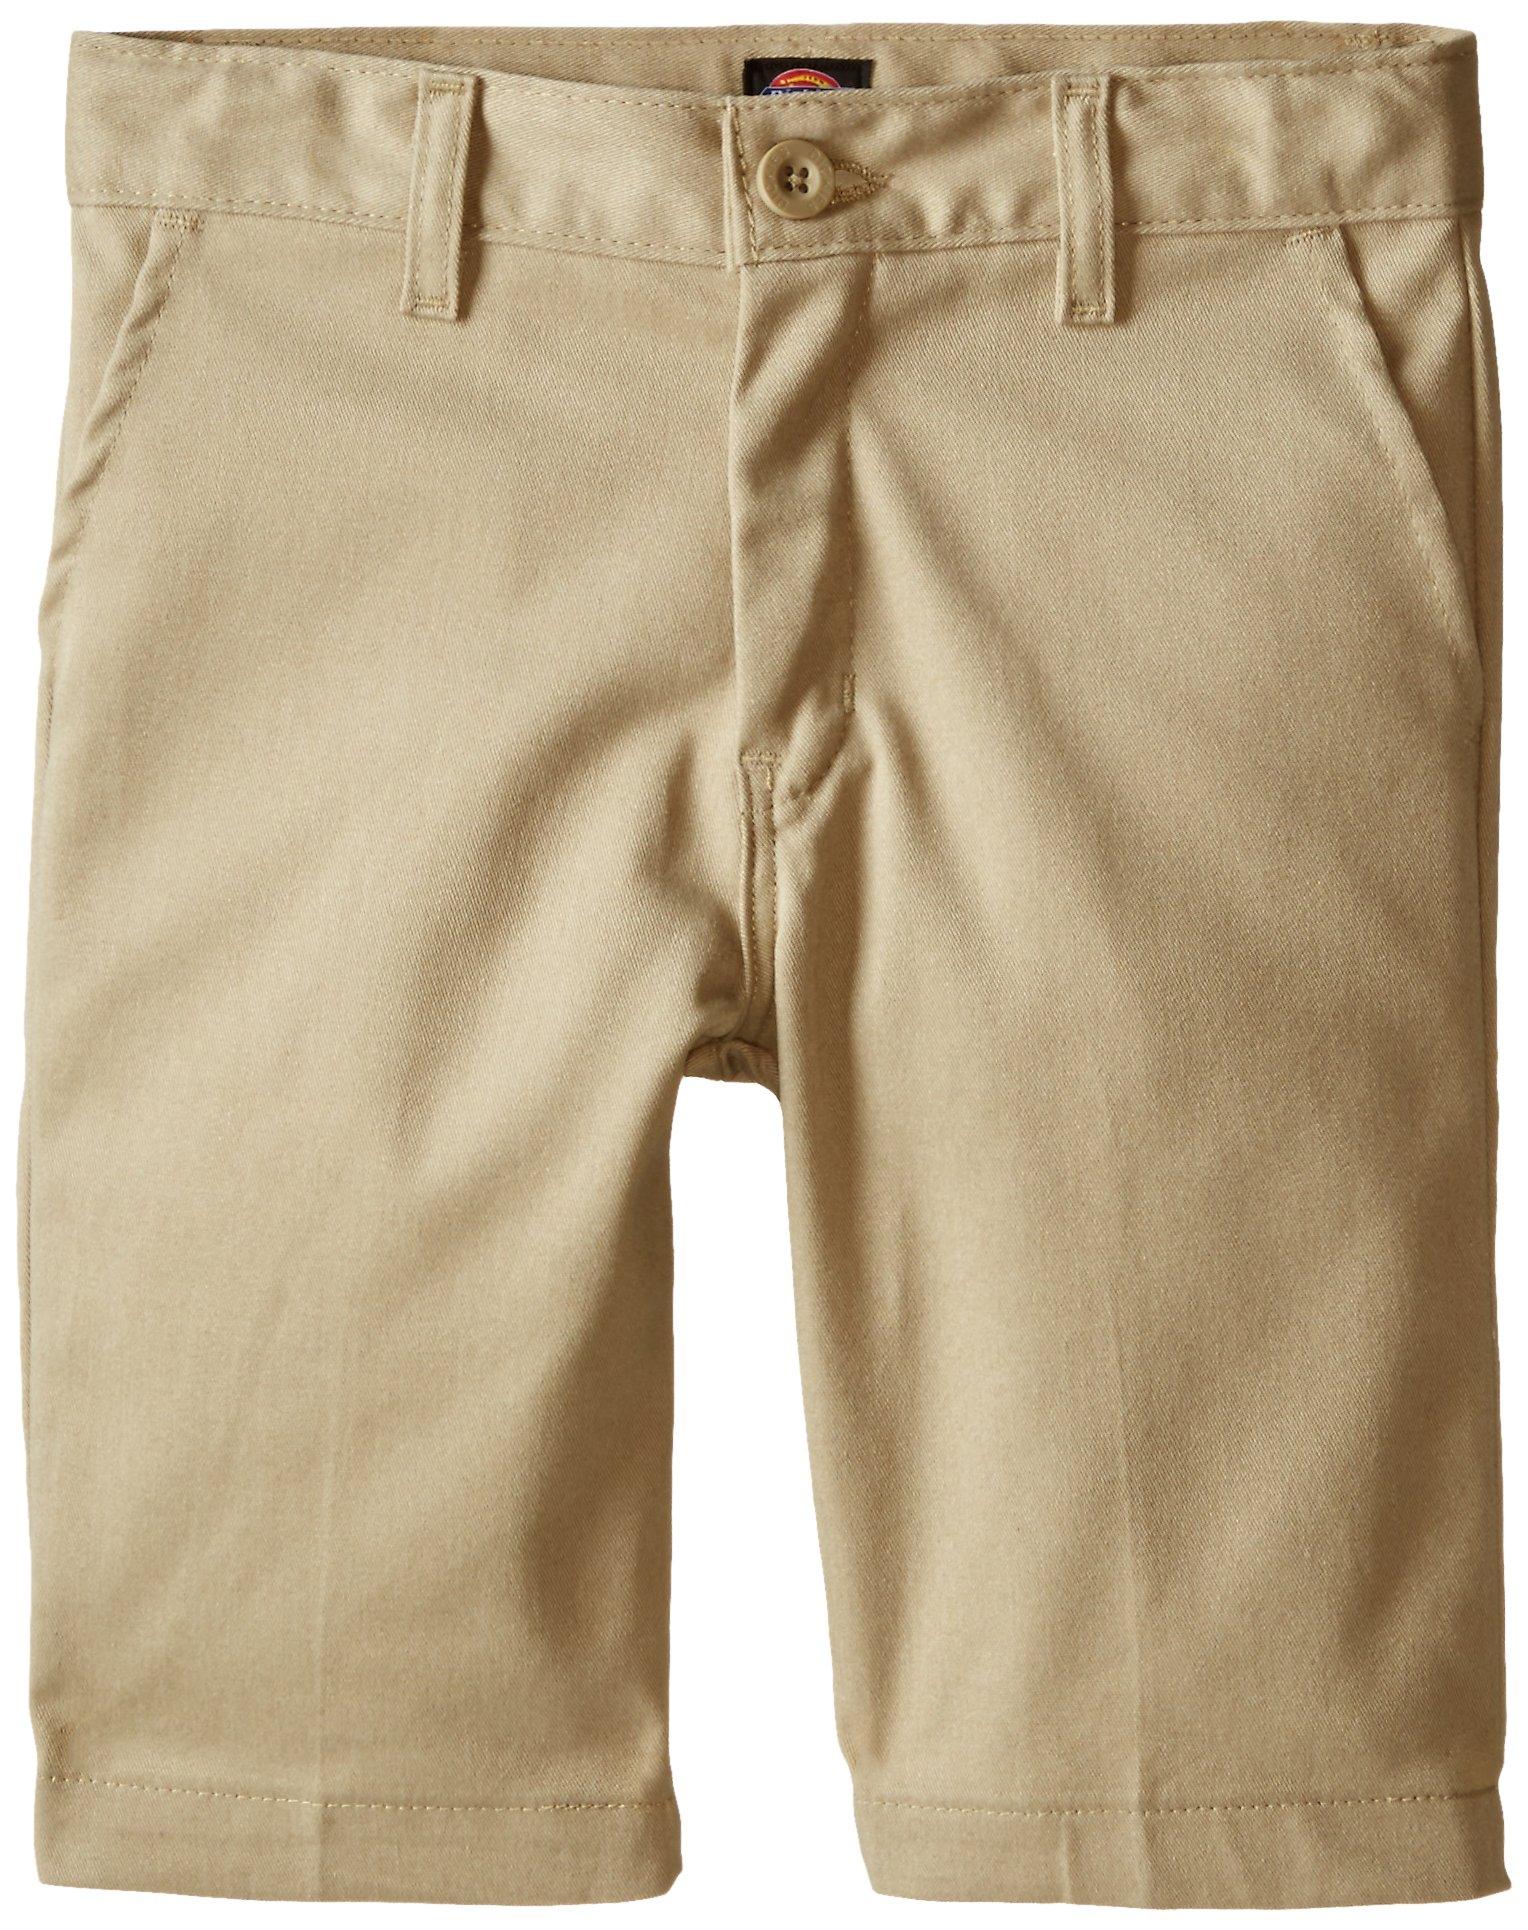 Dickies Khaki Big Boys' Slim Fit Stretch Flat Front Short, Desert Sand, 10